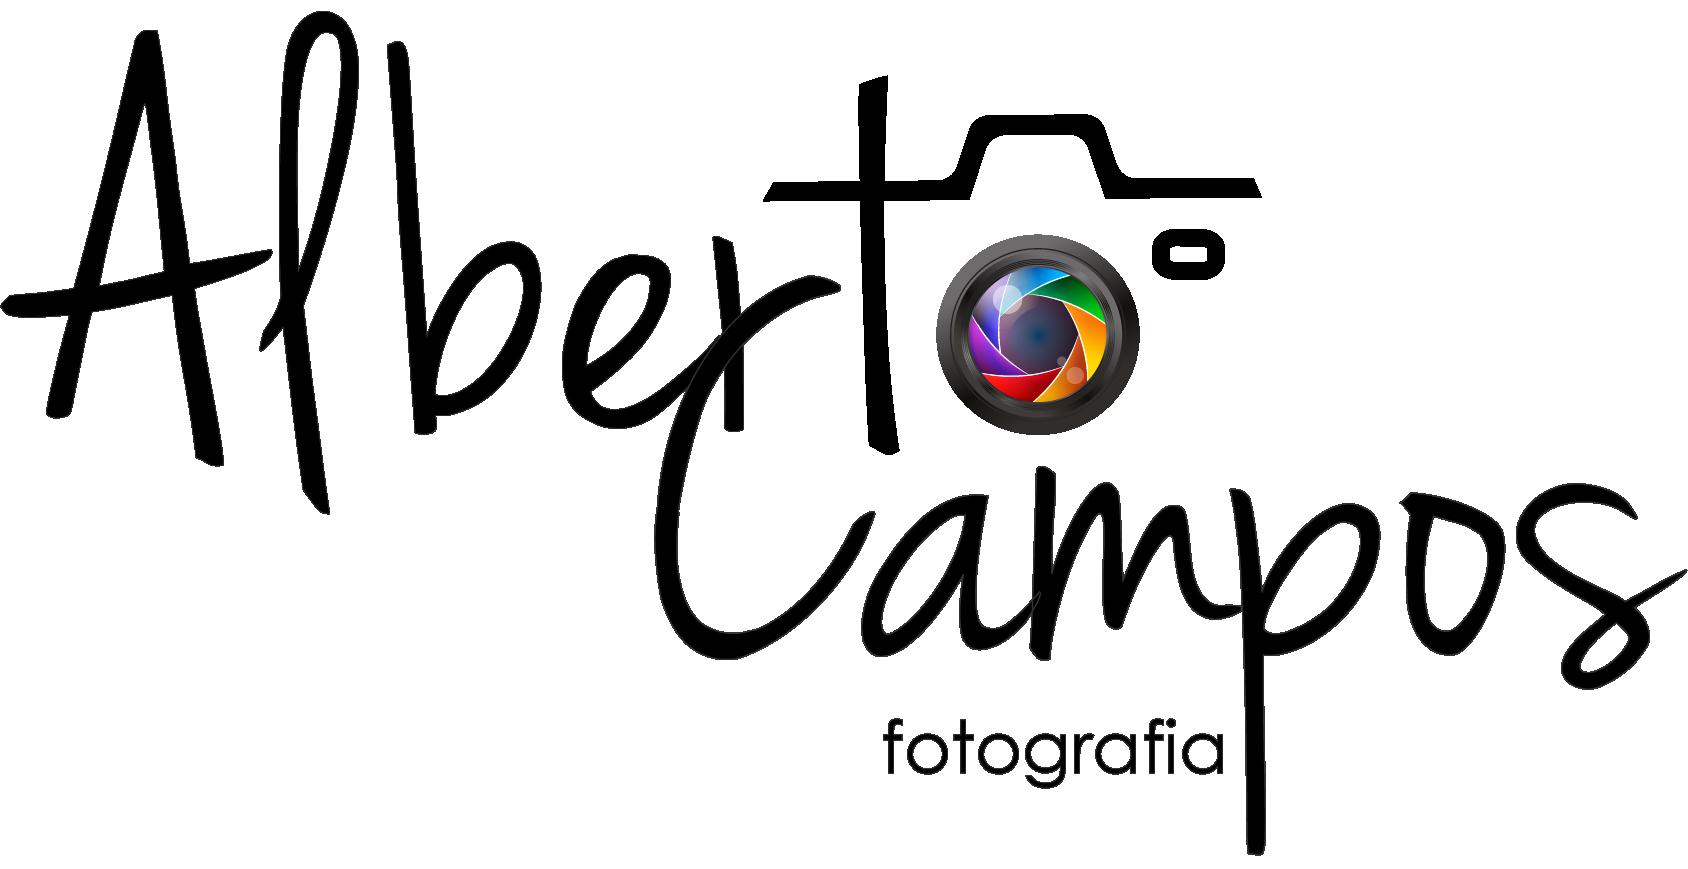 Logomarca Alberto Campos Fotografia